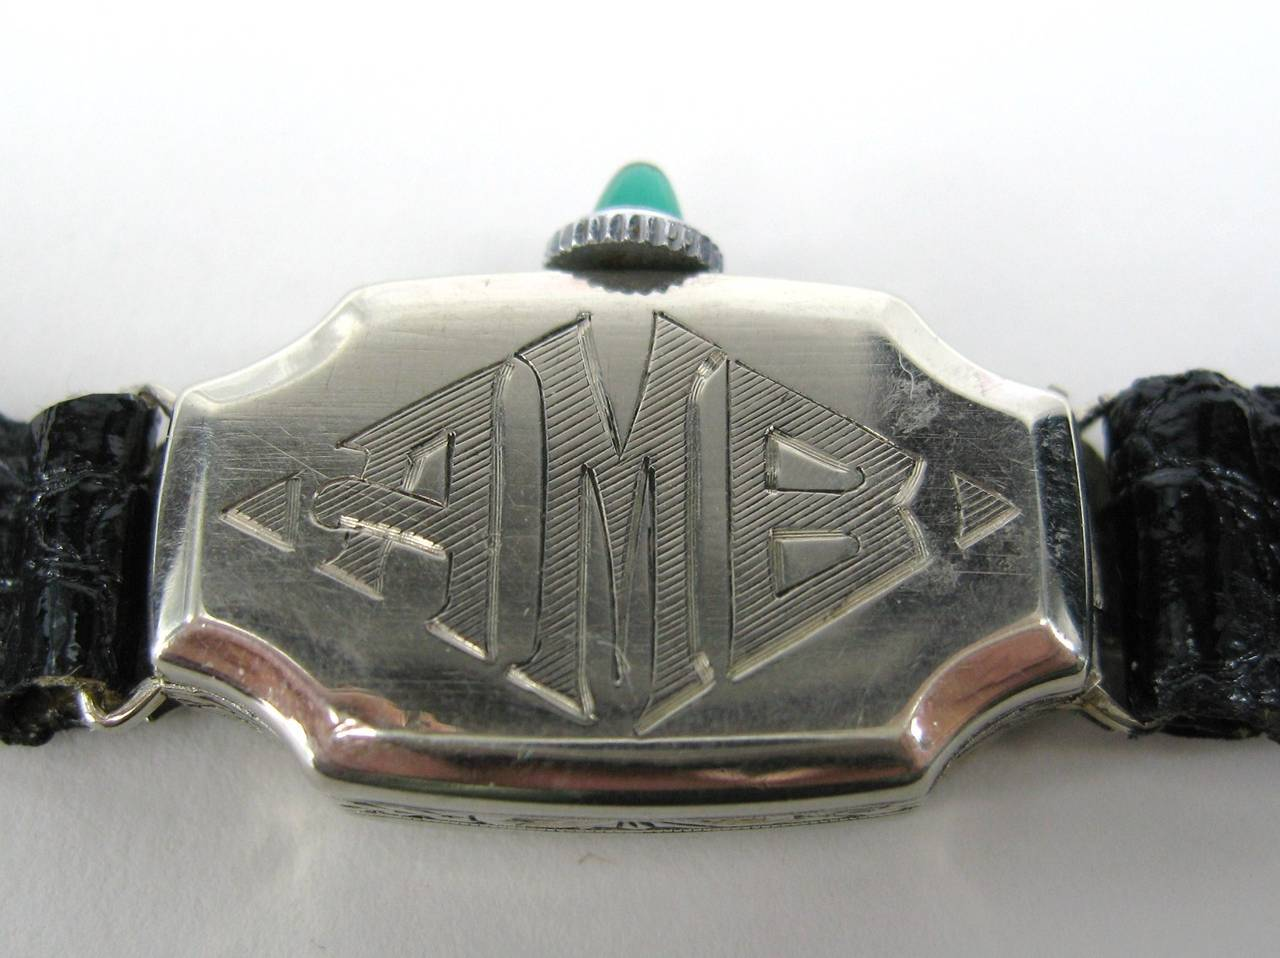 Bruner Lady's White Gold Emerald Diamond Art Deco Wristwatch Circa 1930s 3